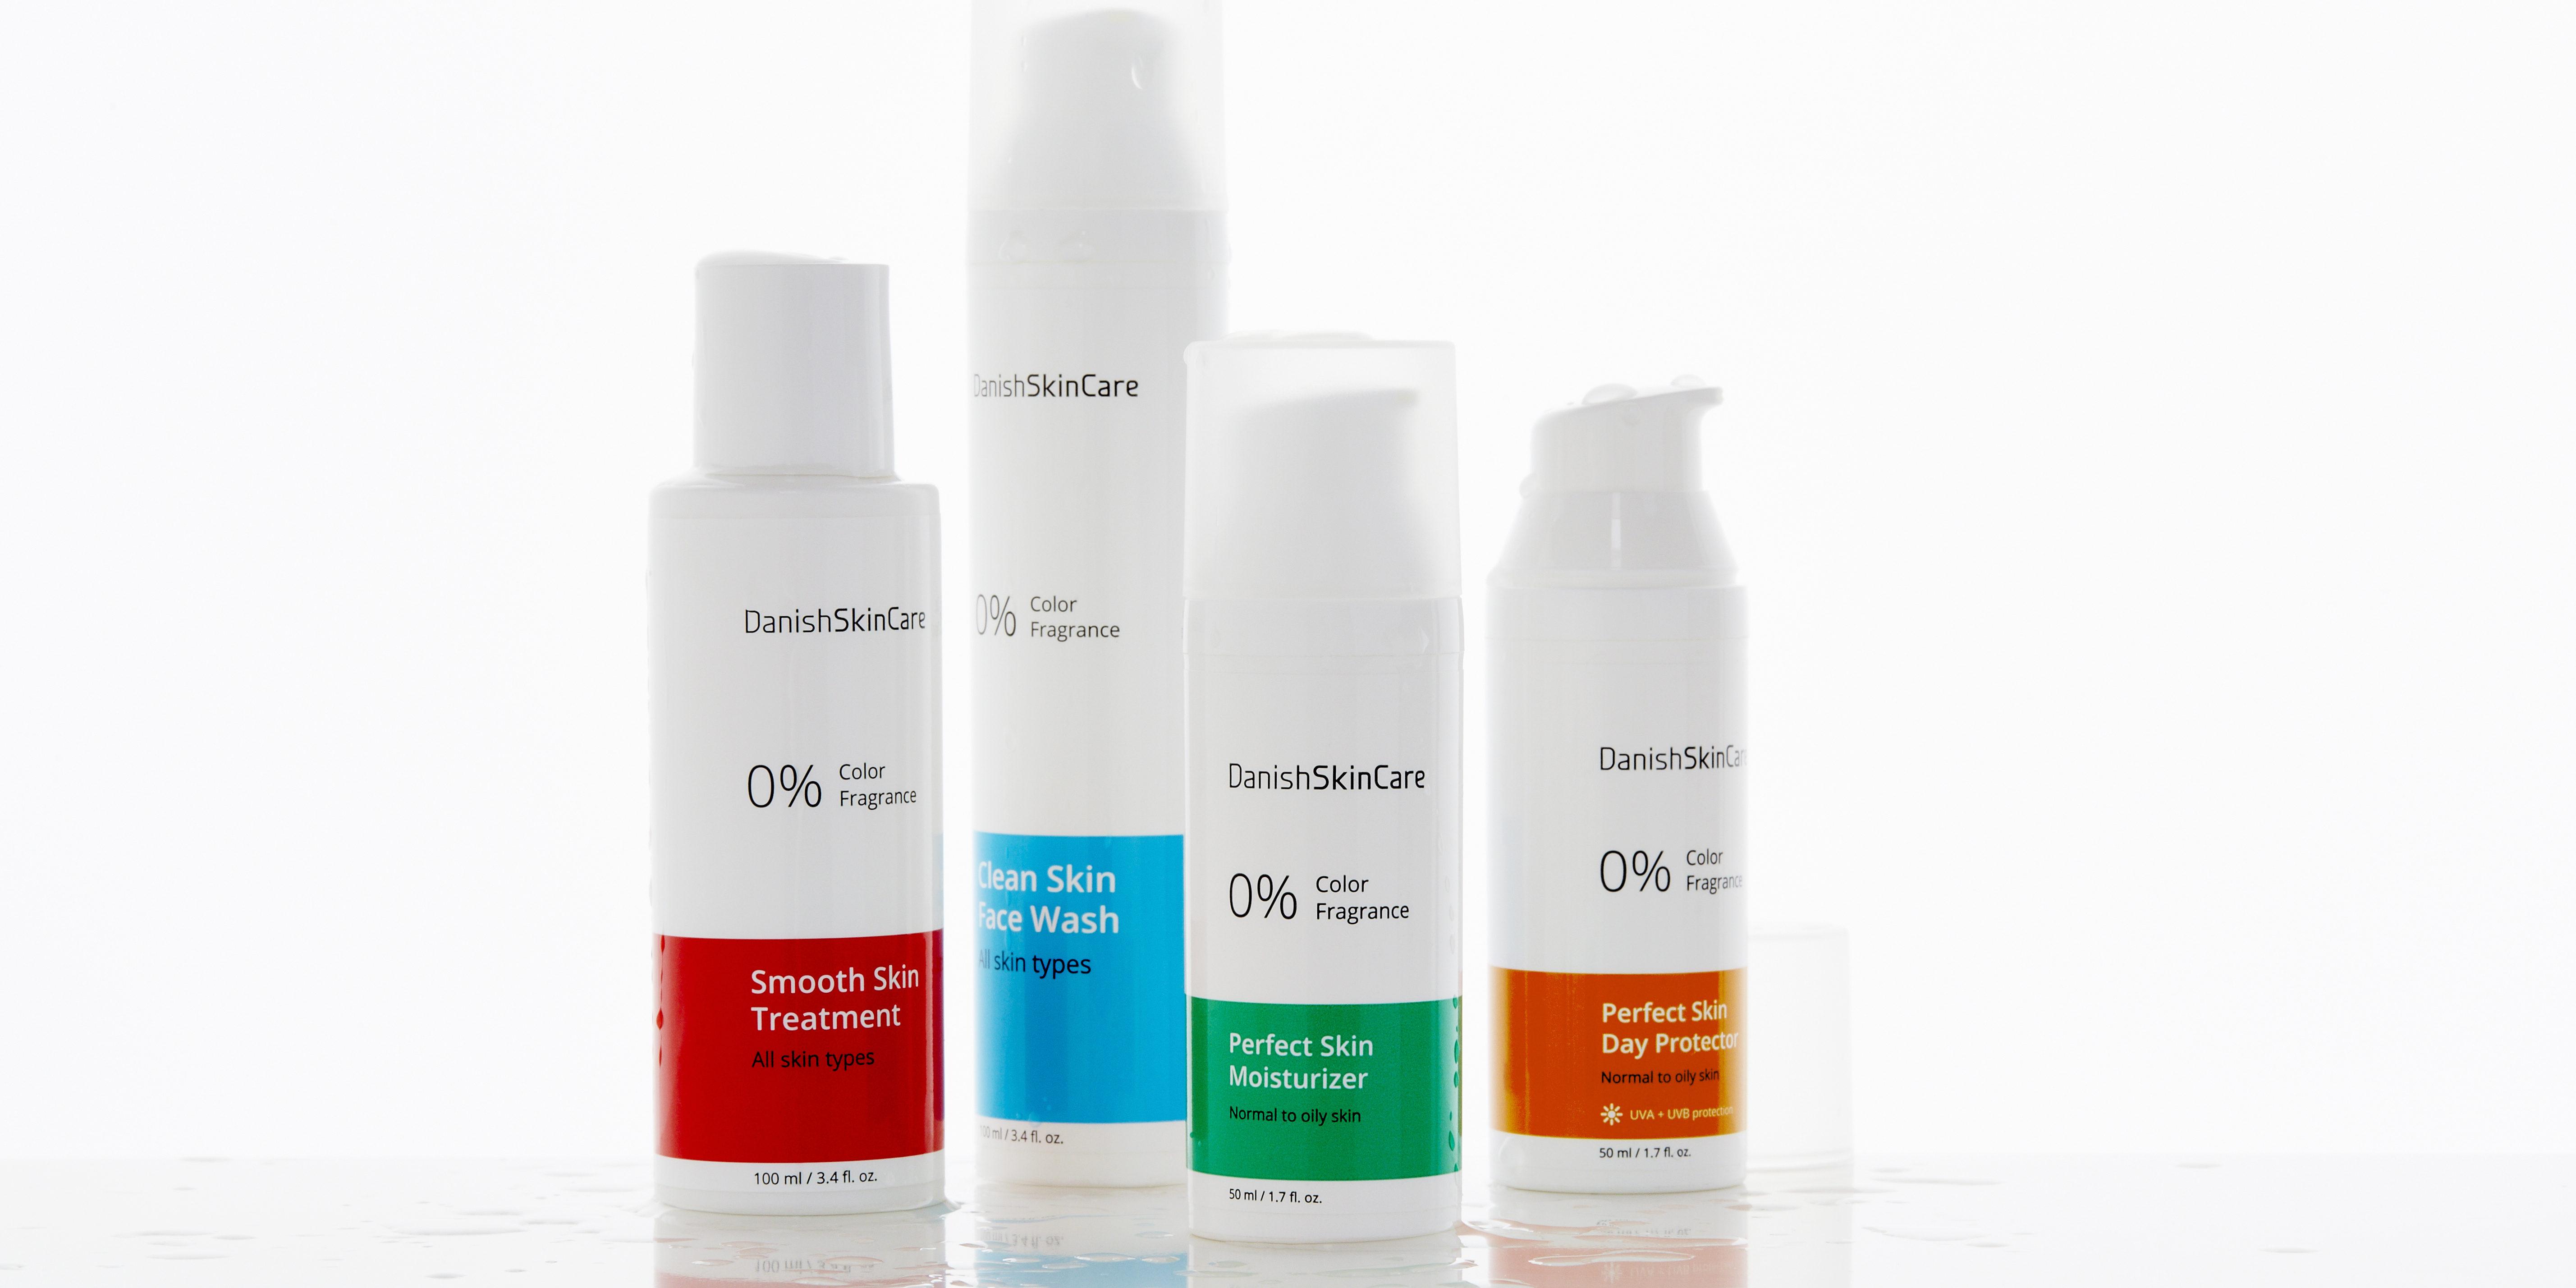 danish skin care tilbud